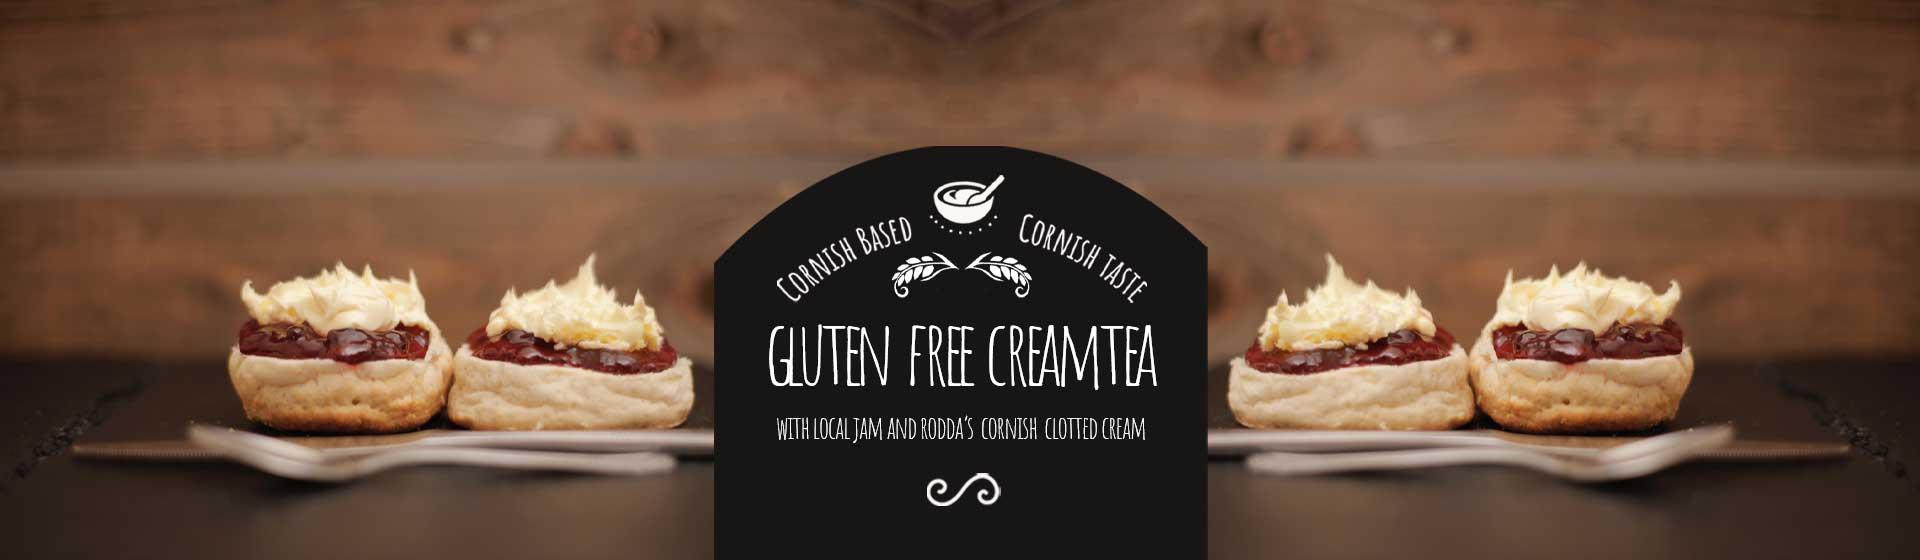 Gluten Free Cream Tea